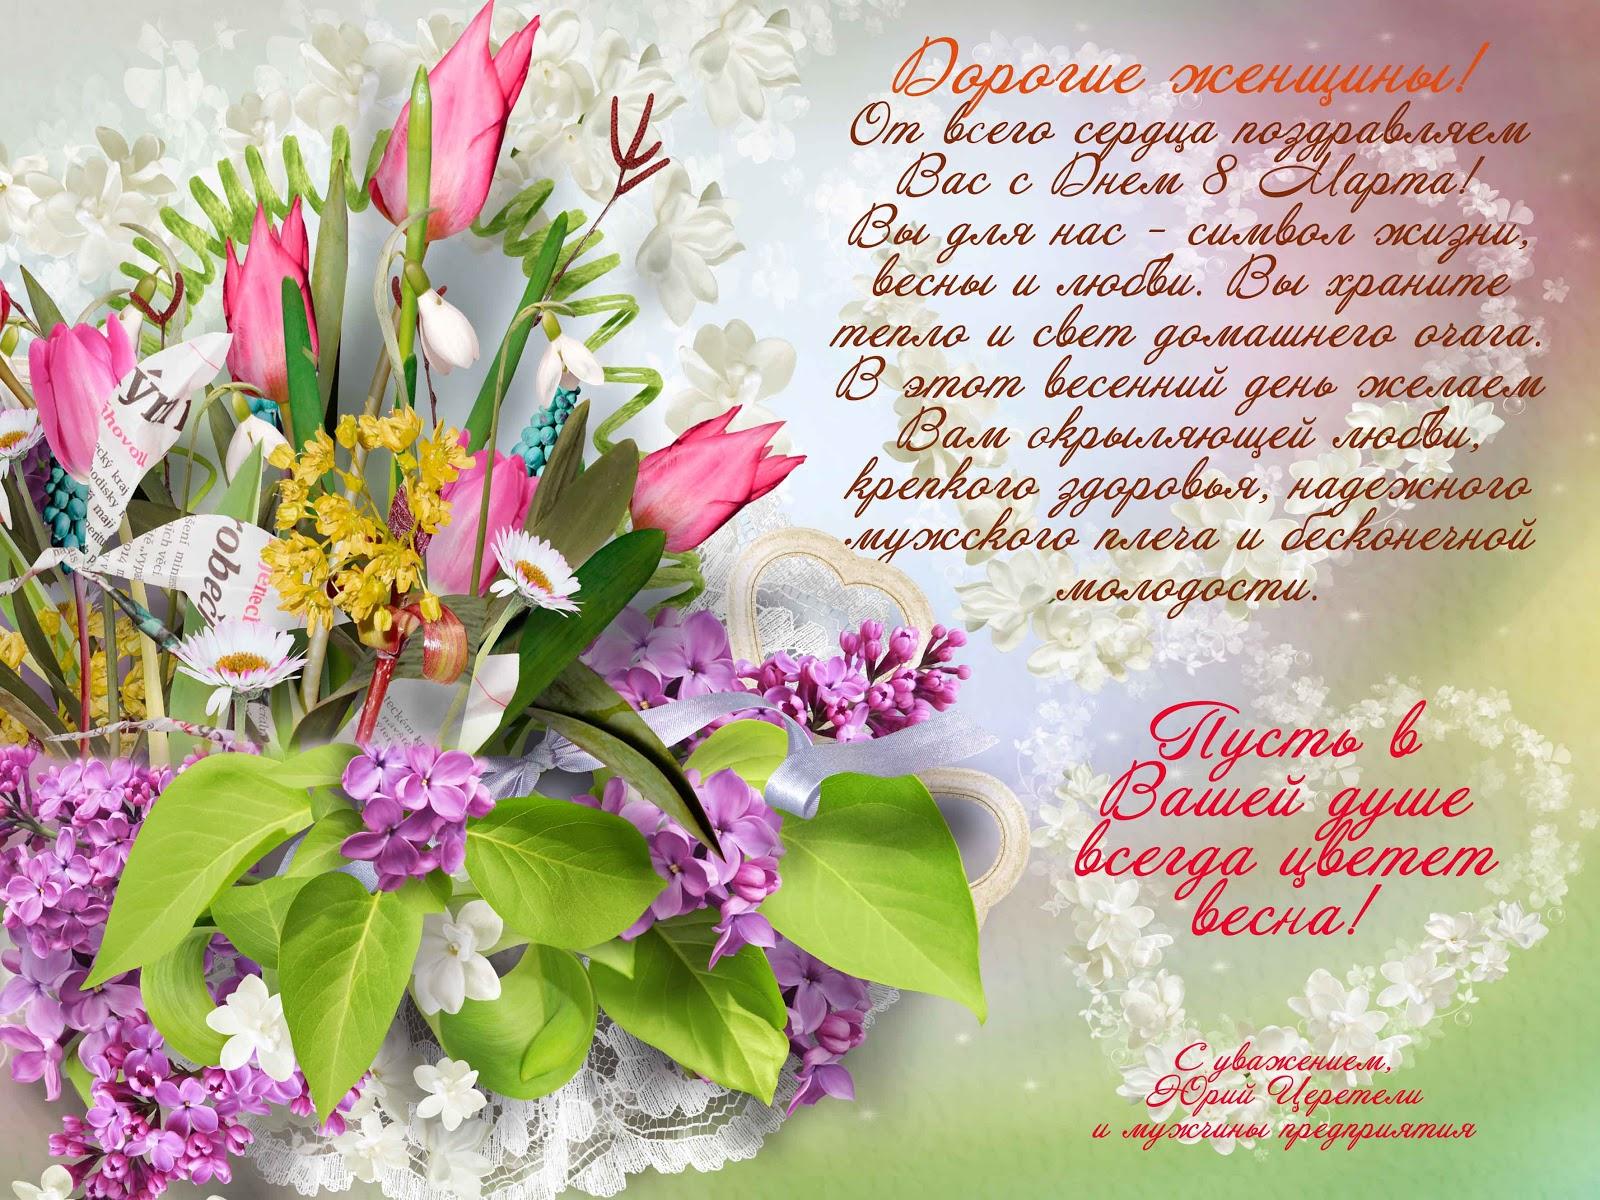 Svetbond-дизайн: Плакат-стенгазета к 8 марта